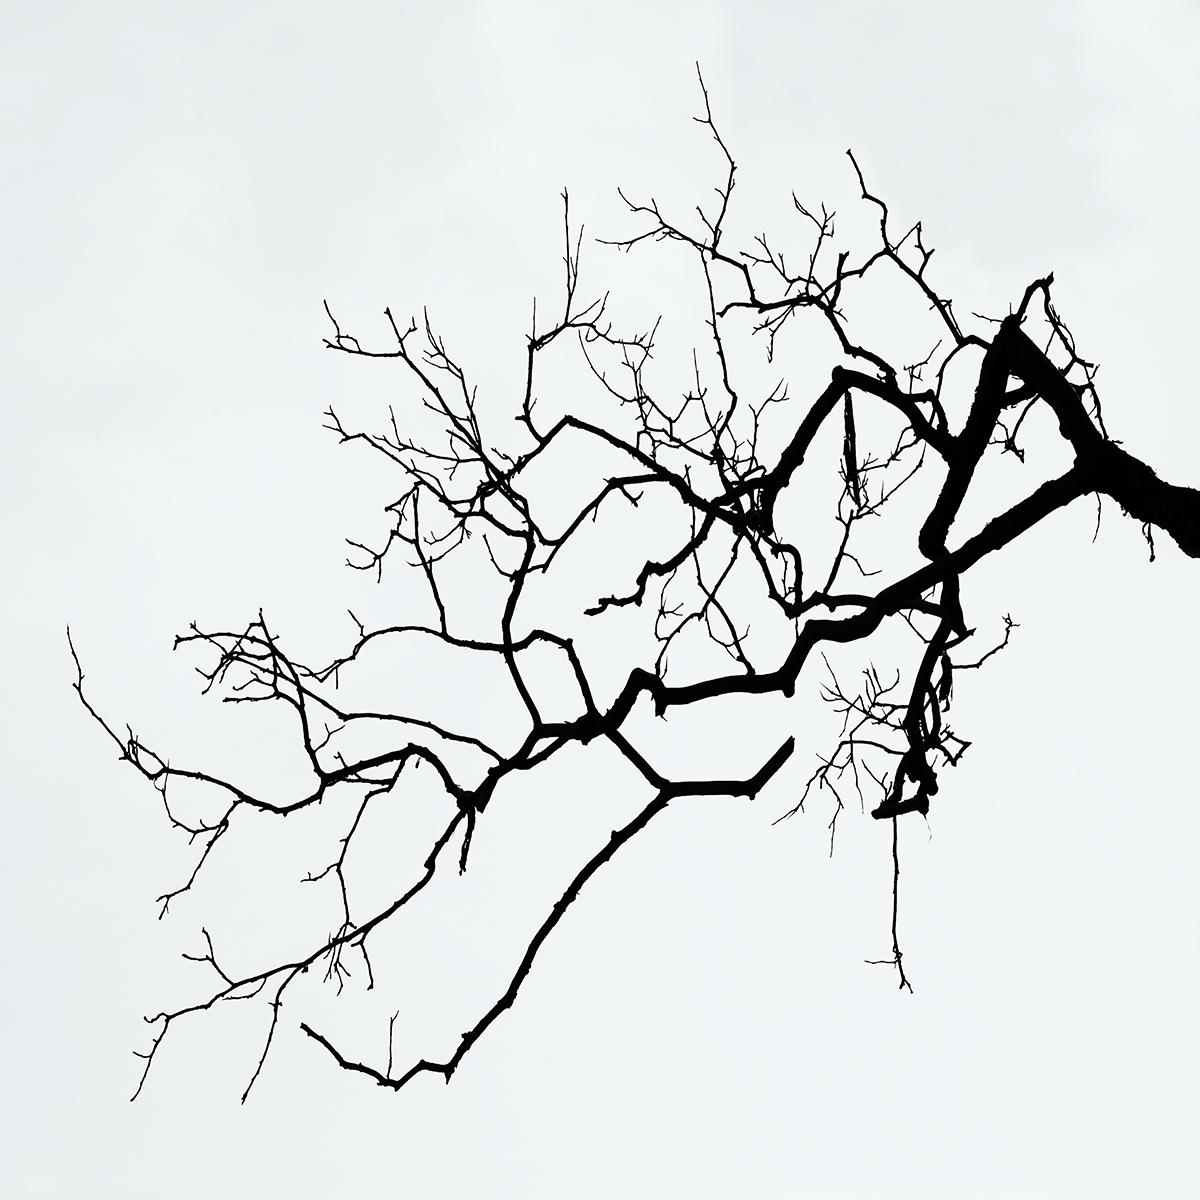 old_branch_10x10_highres.jpg